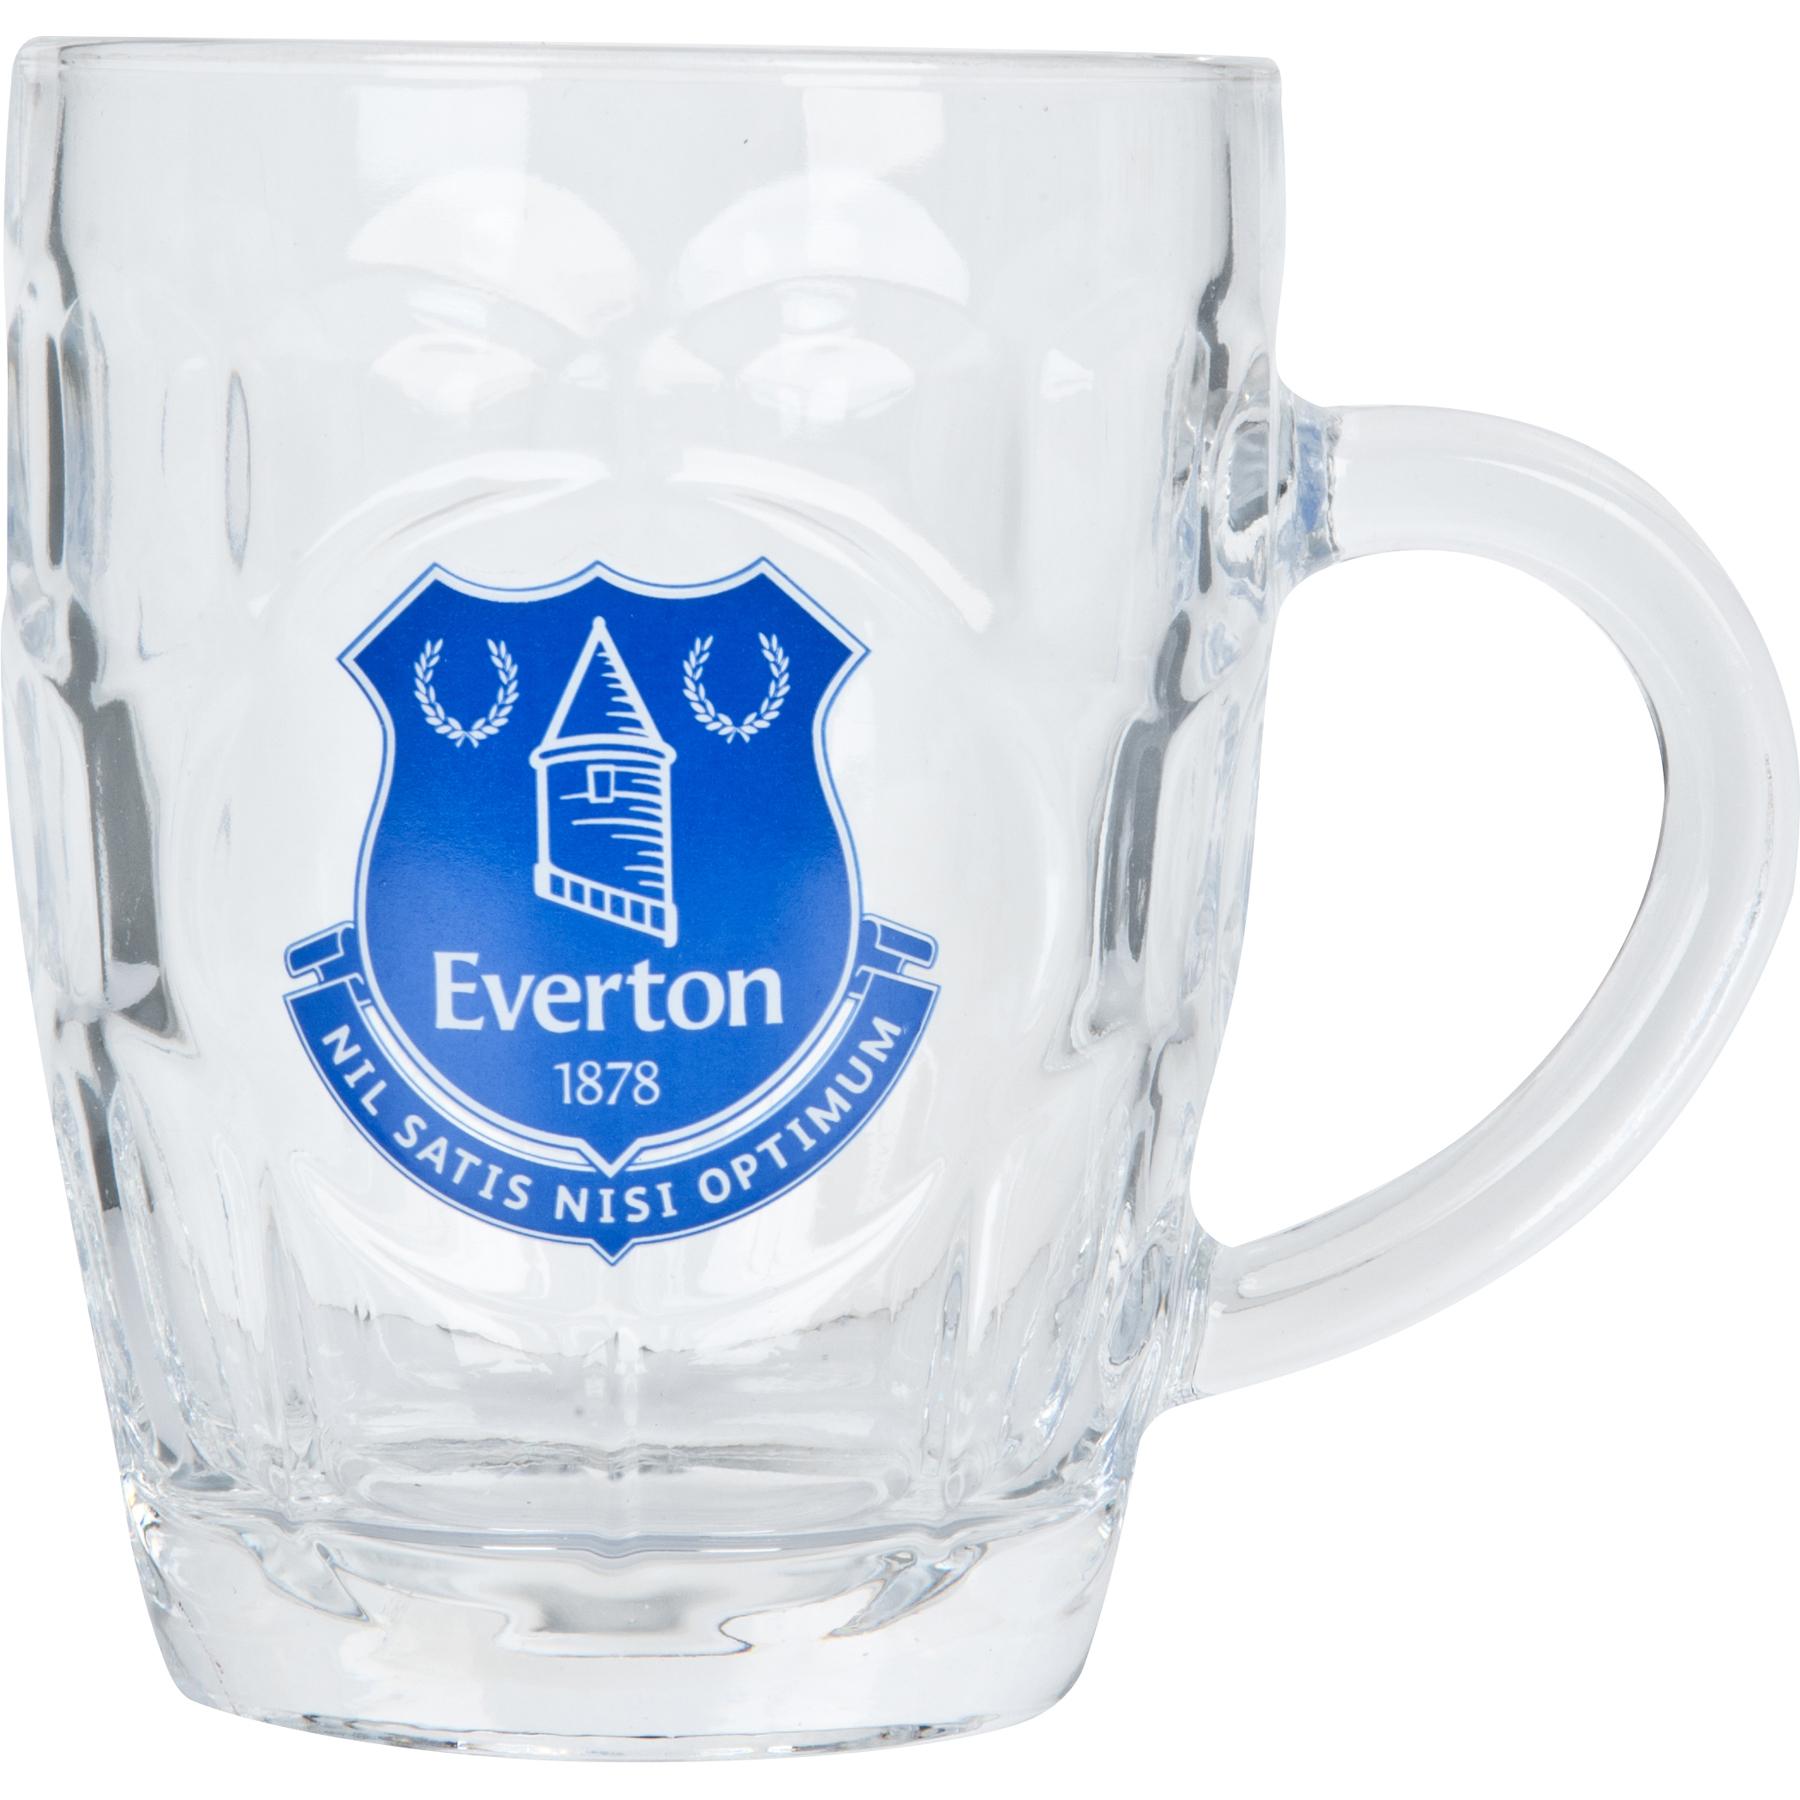 Everton Dimple Pint Glass